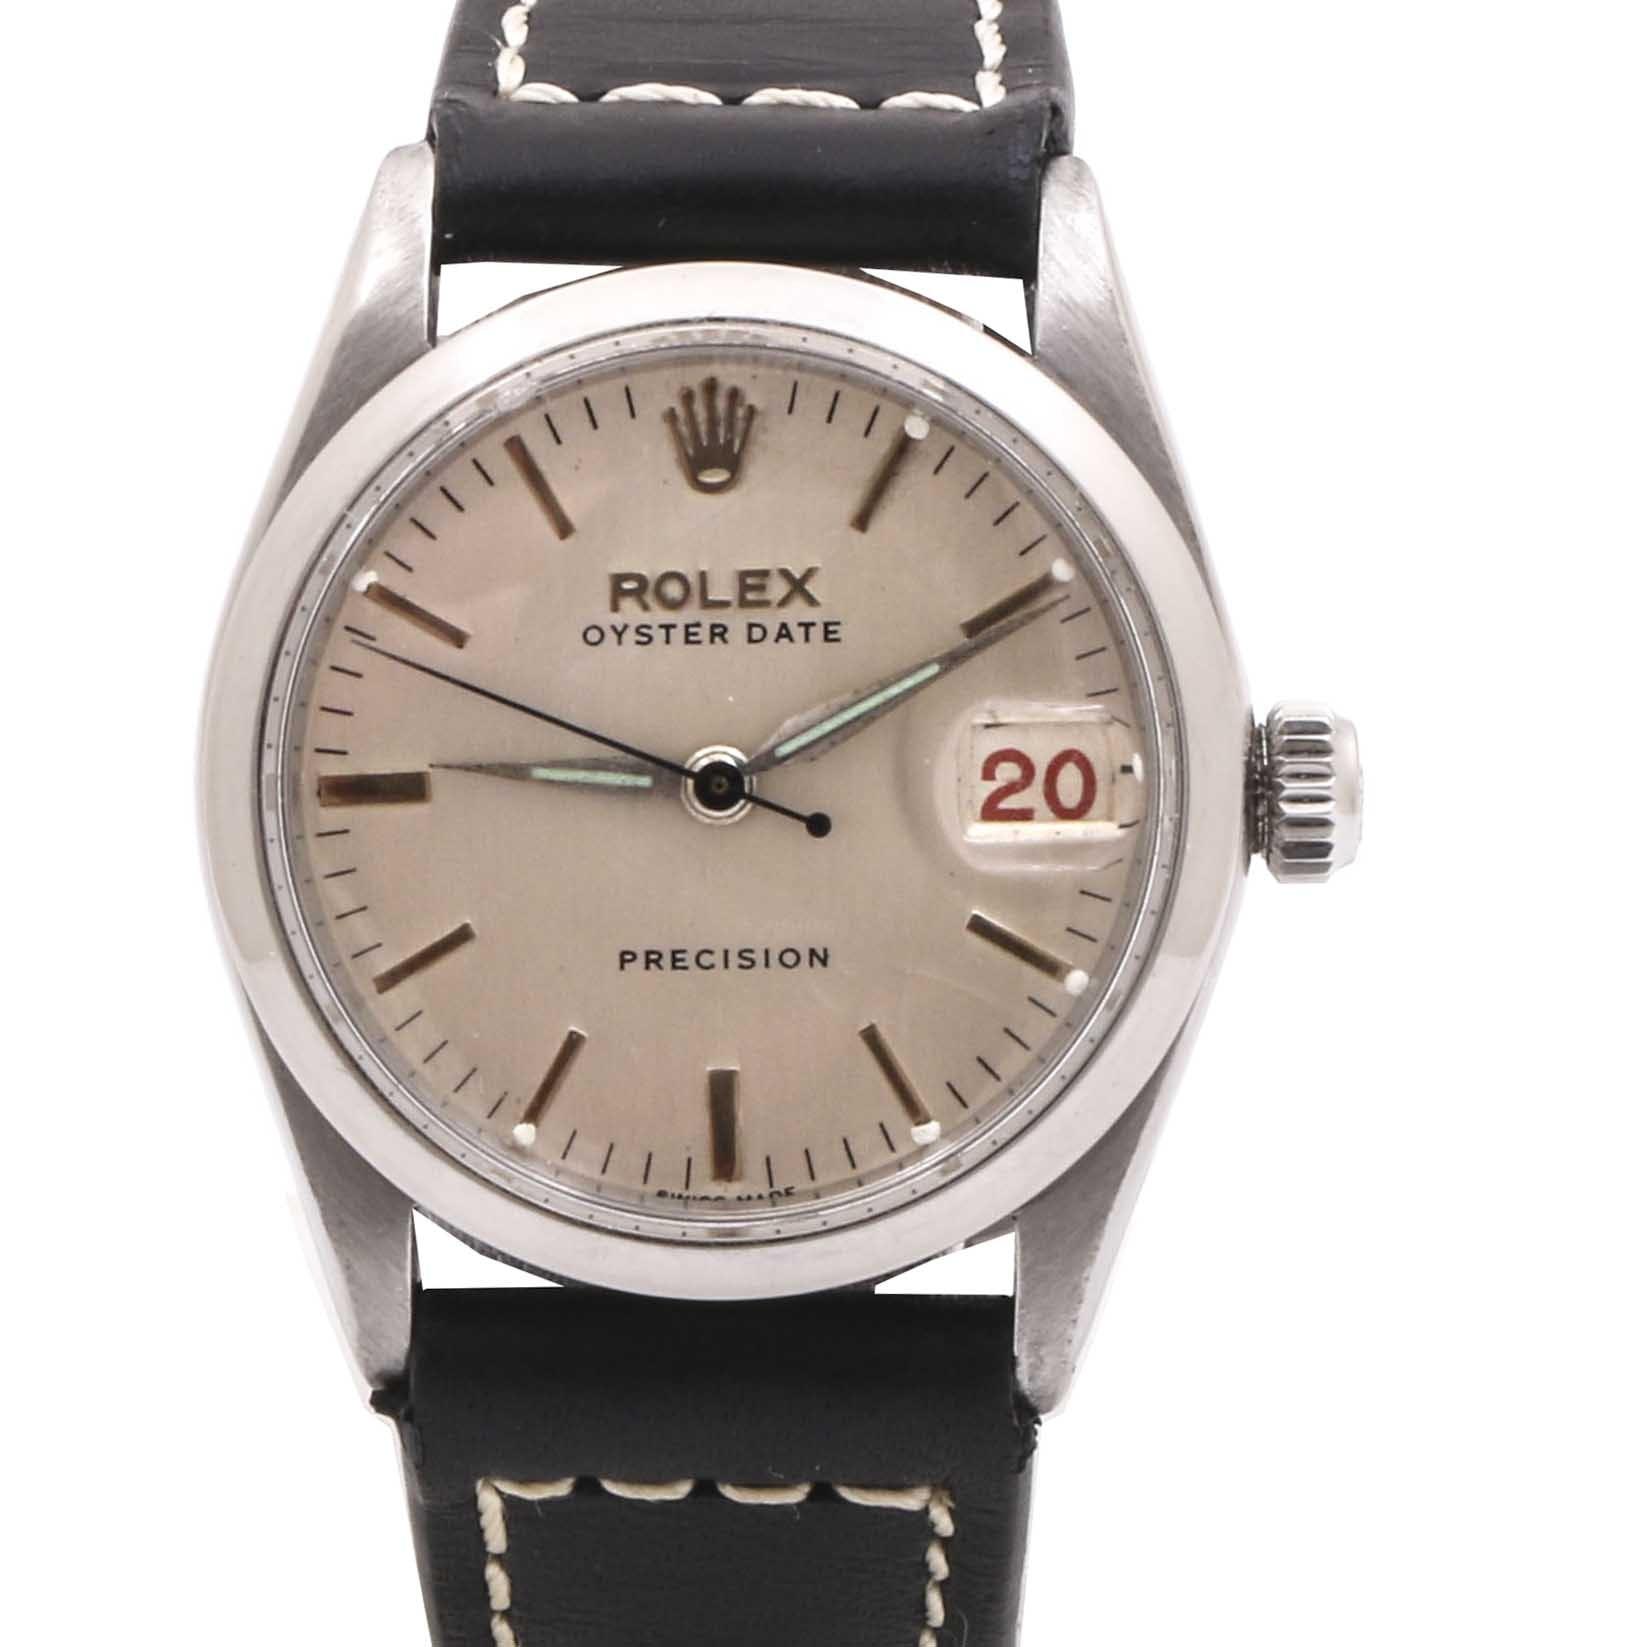 Vintage Rolex Oyster Date Precision Wristwatch